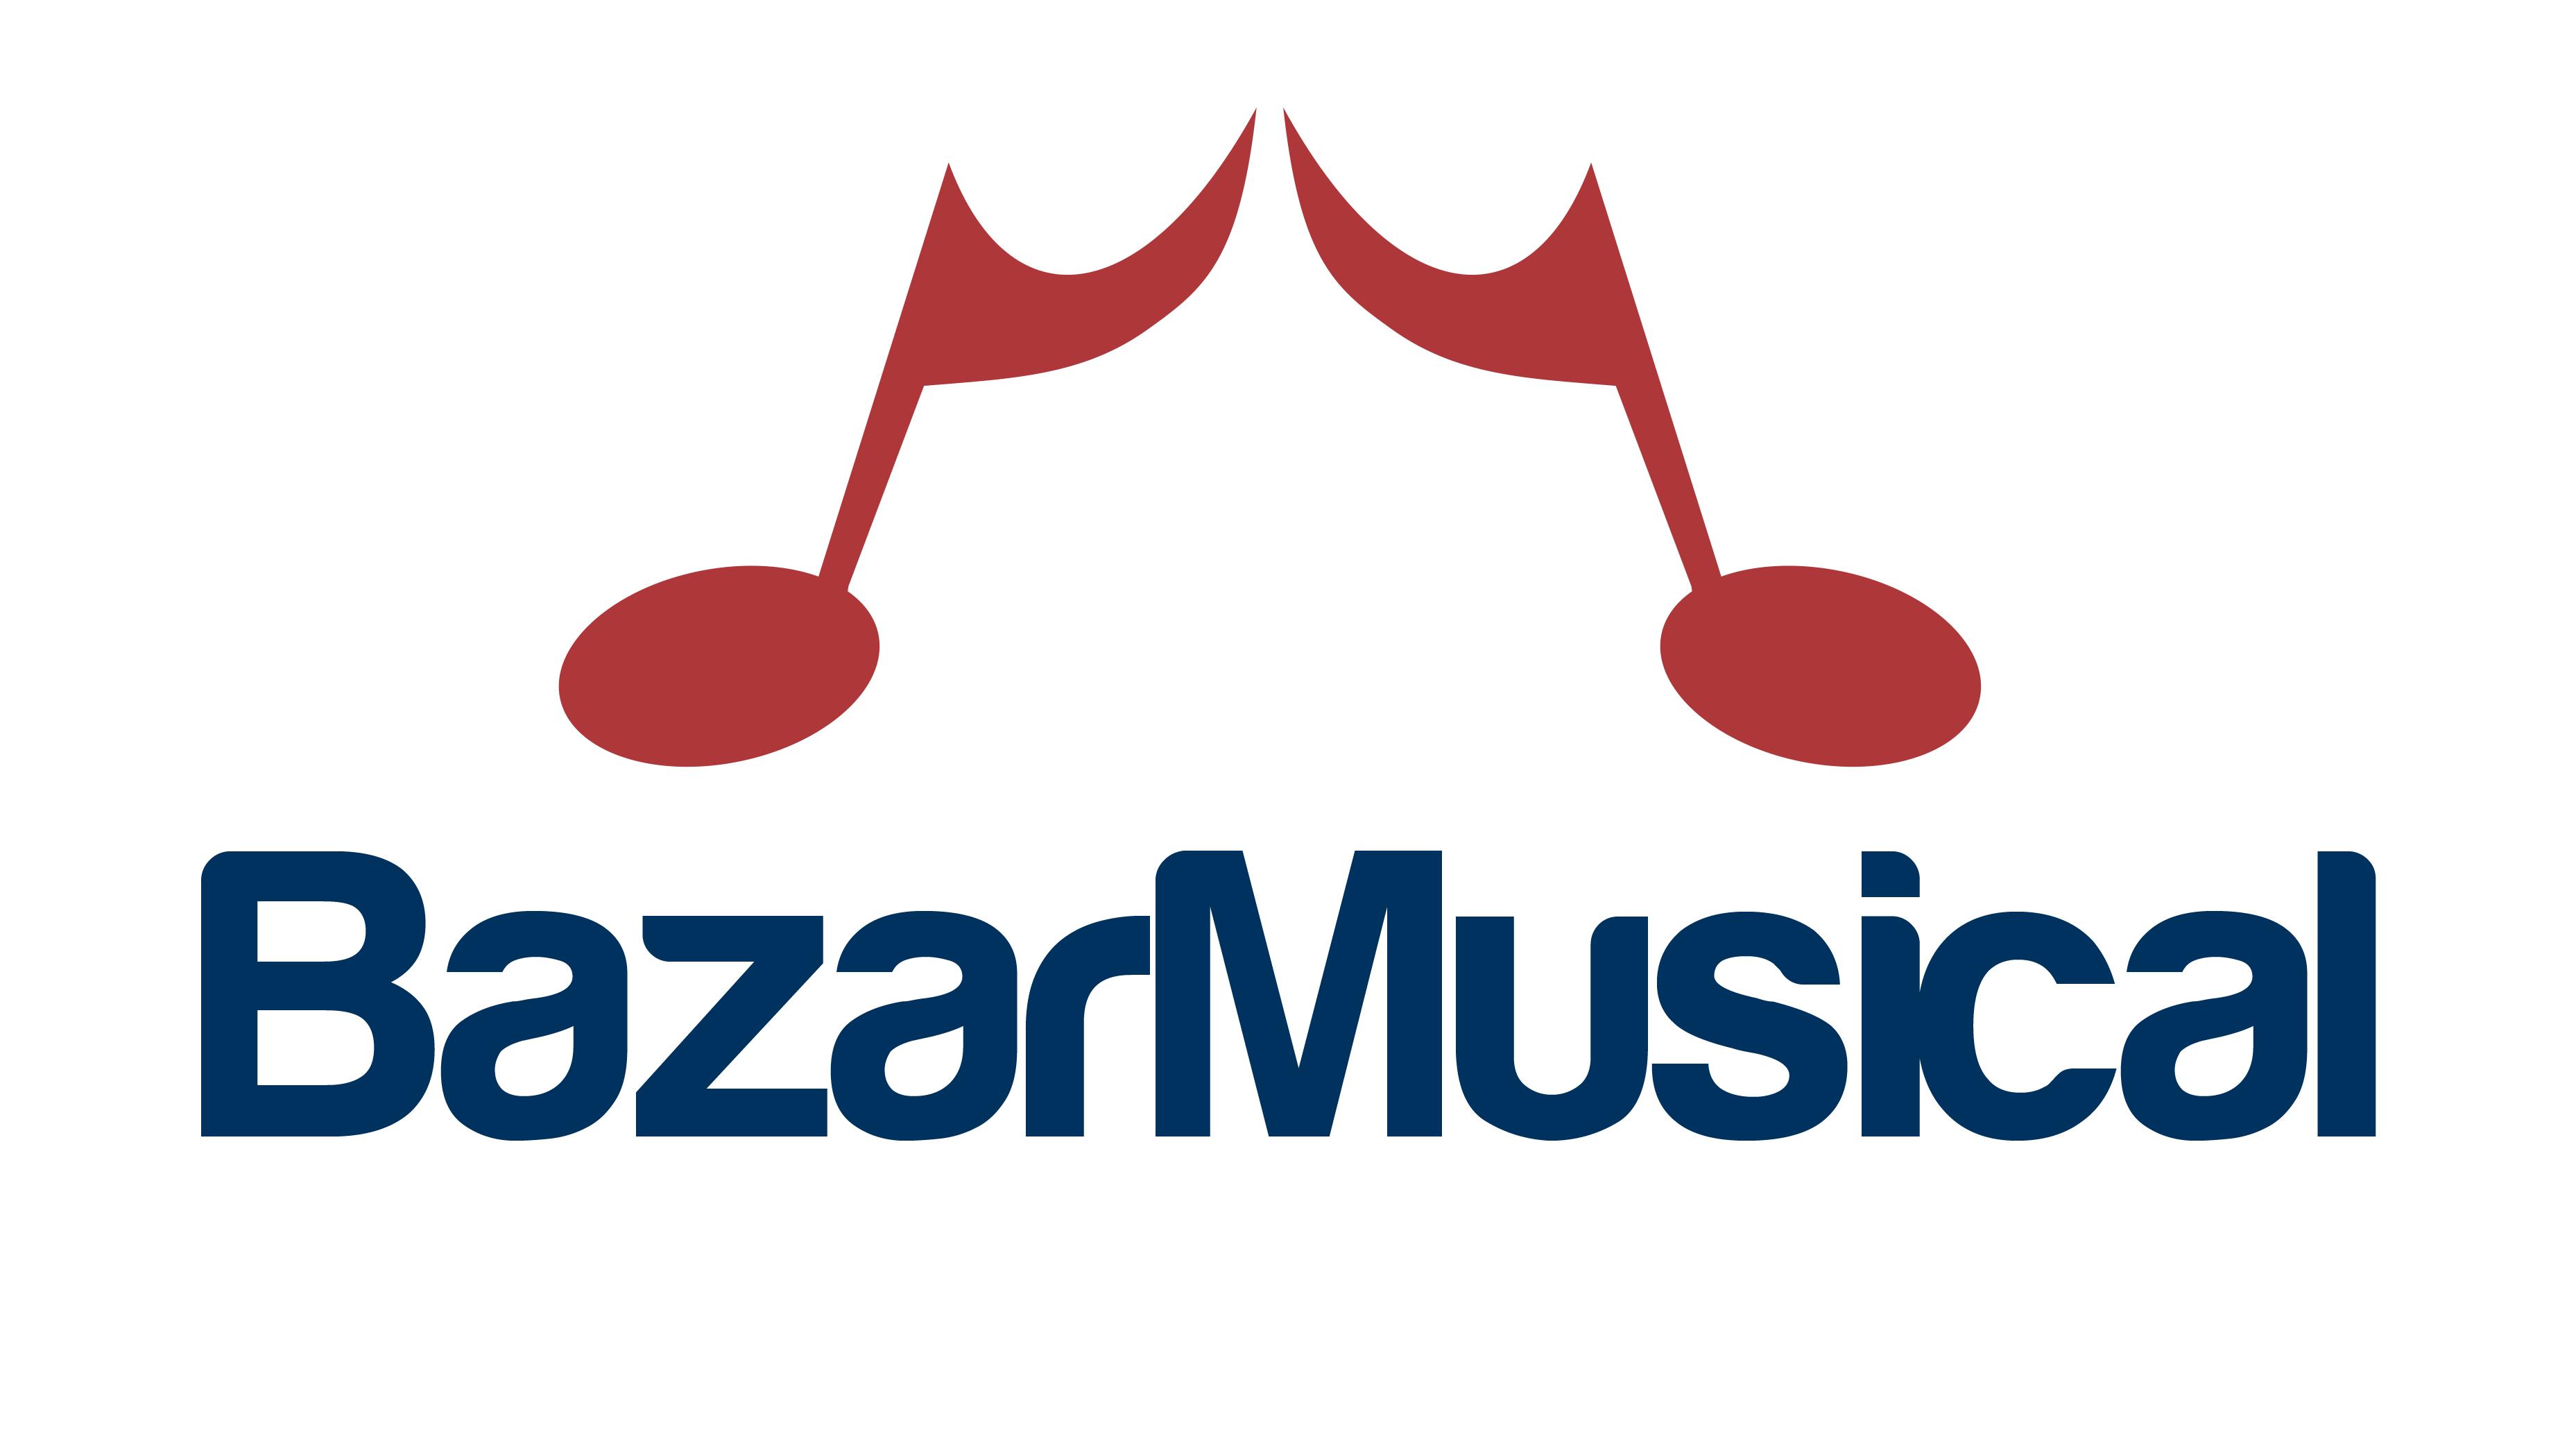 Bazar Musical